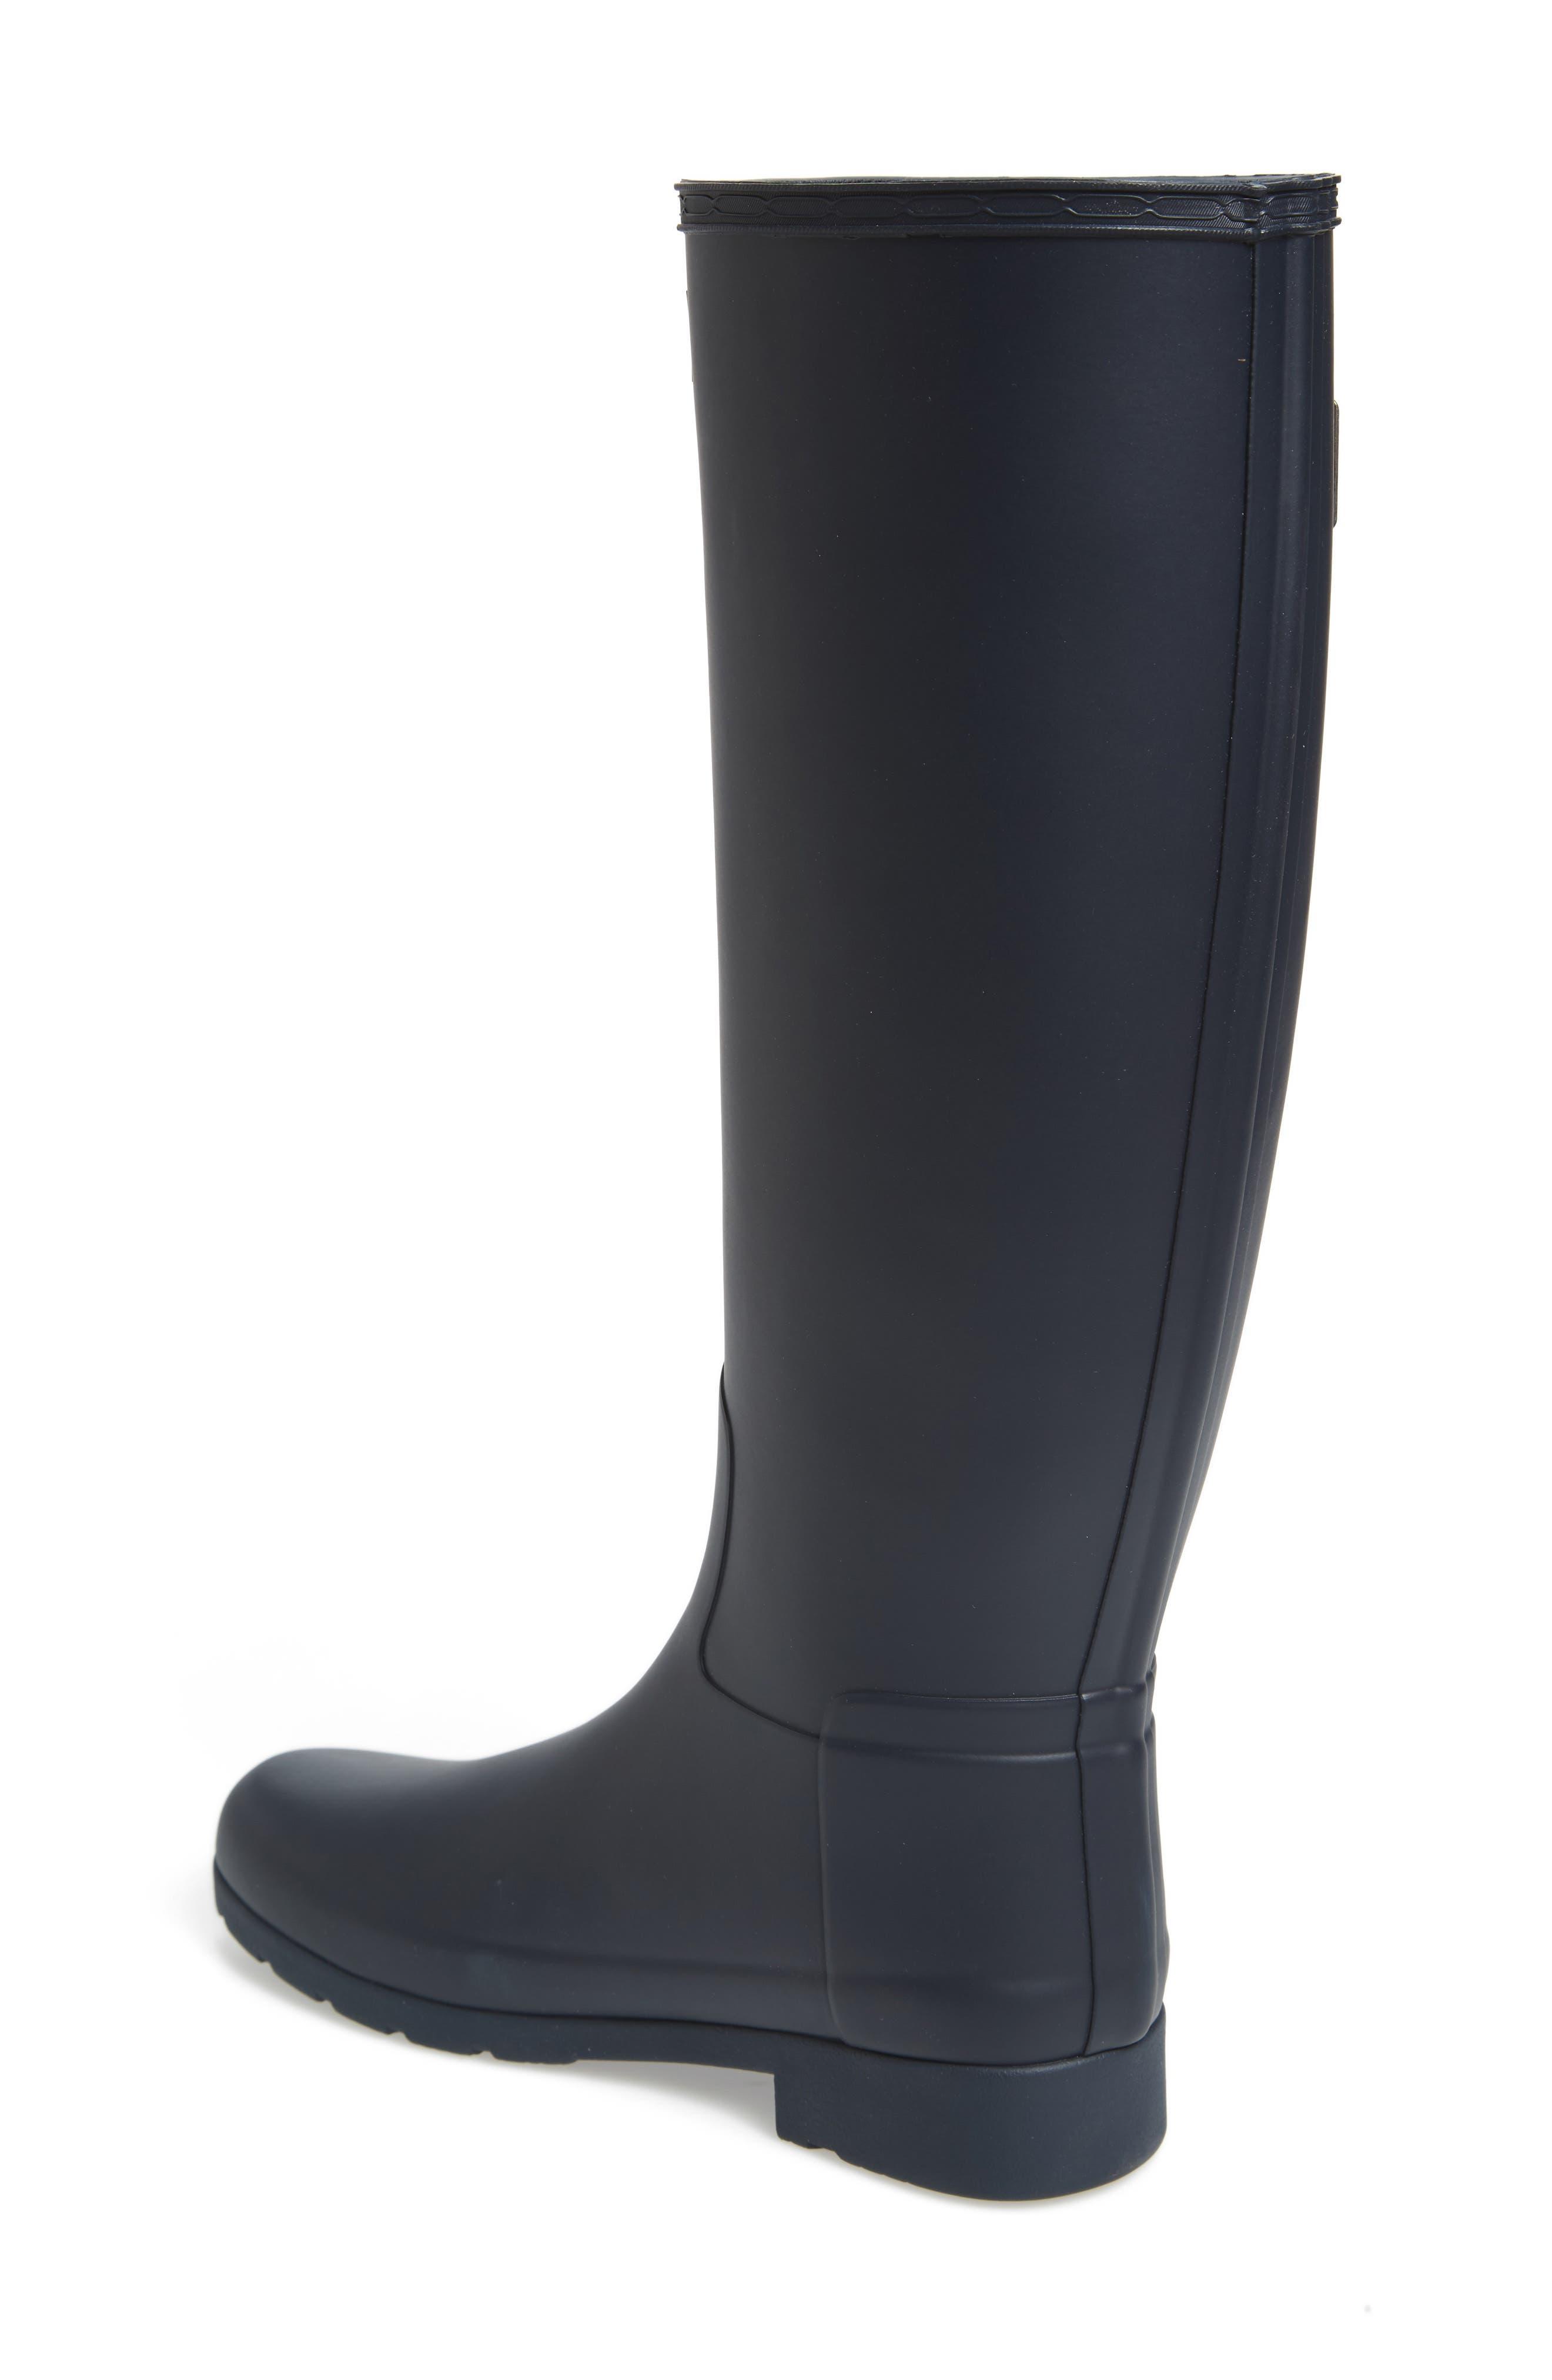 HUNTER, Original Refined Waterproof Rain Boot, Alternate thumbnail 2, color, NAVY